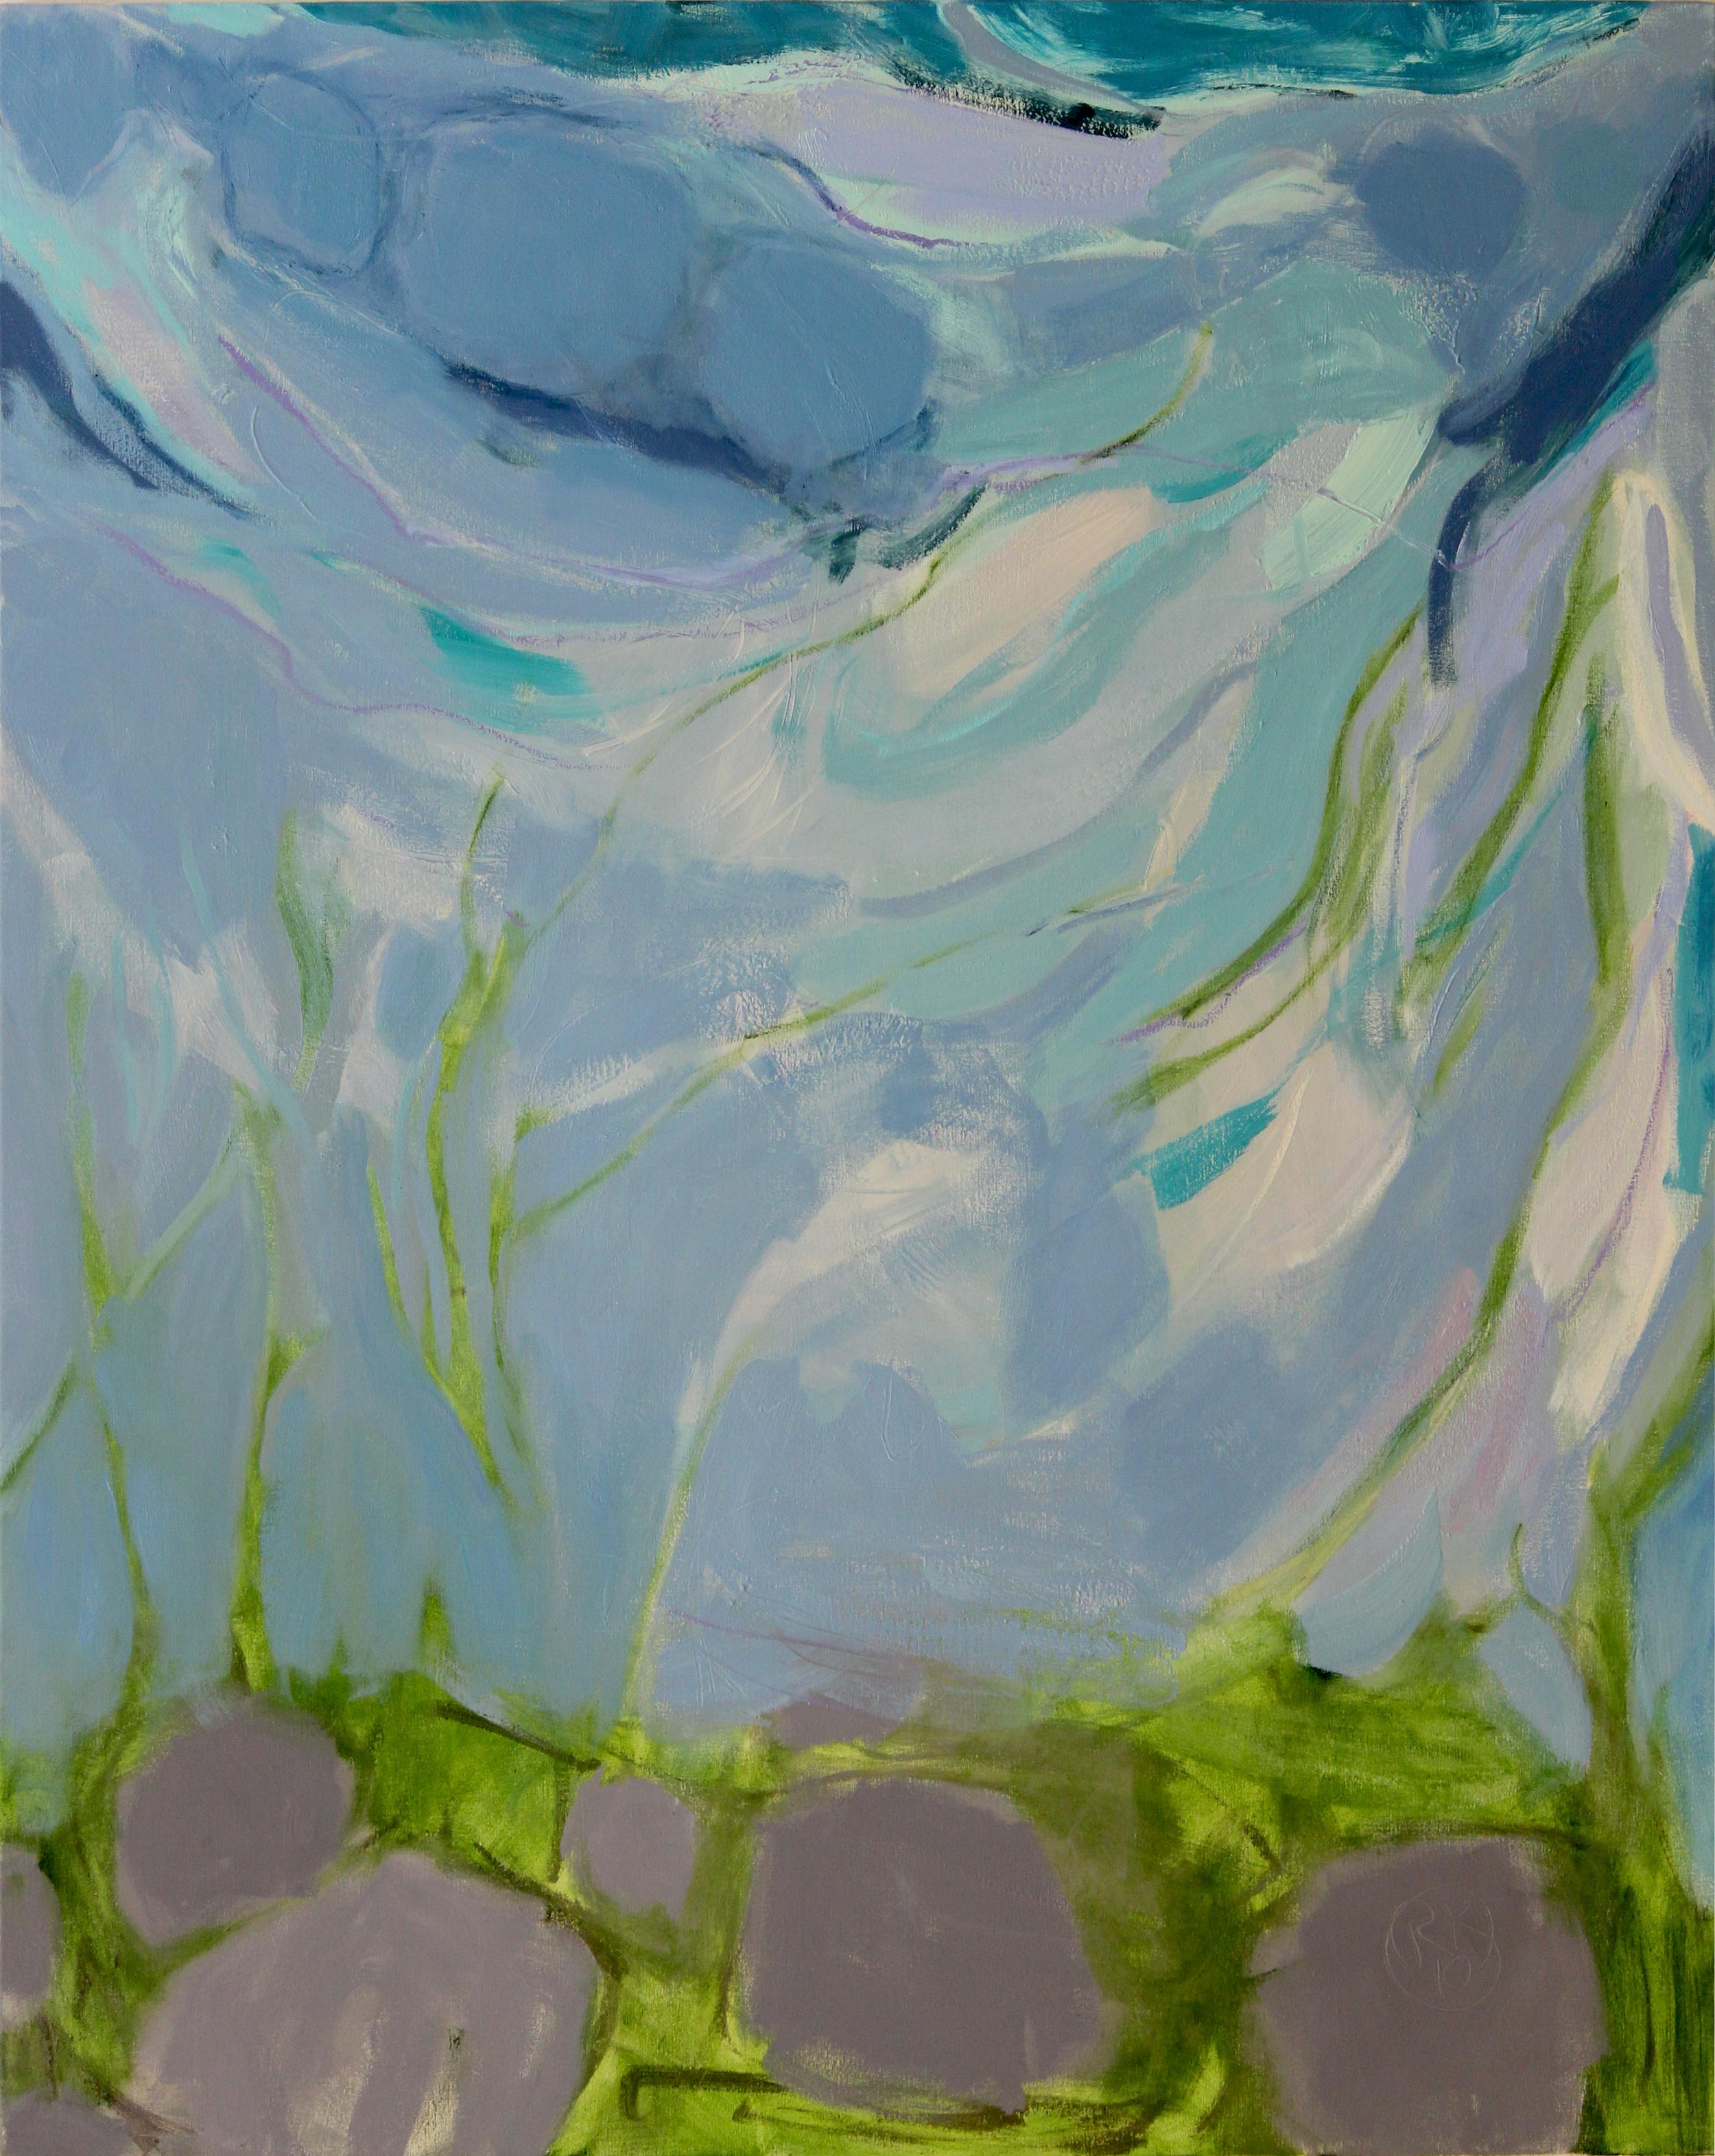 Air, moss & rocks, II